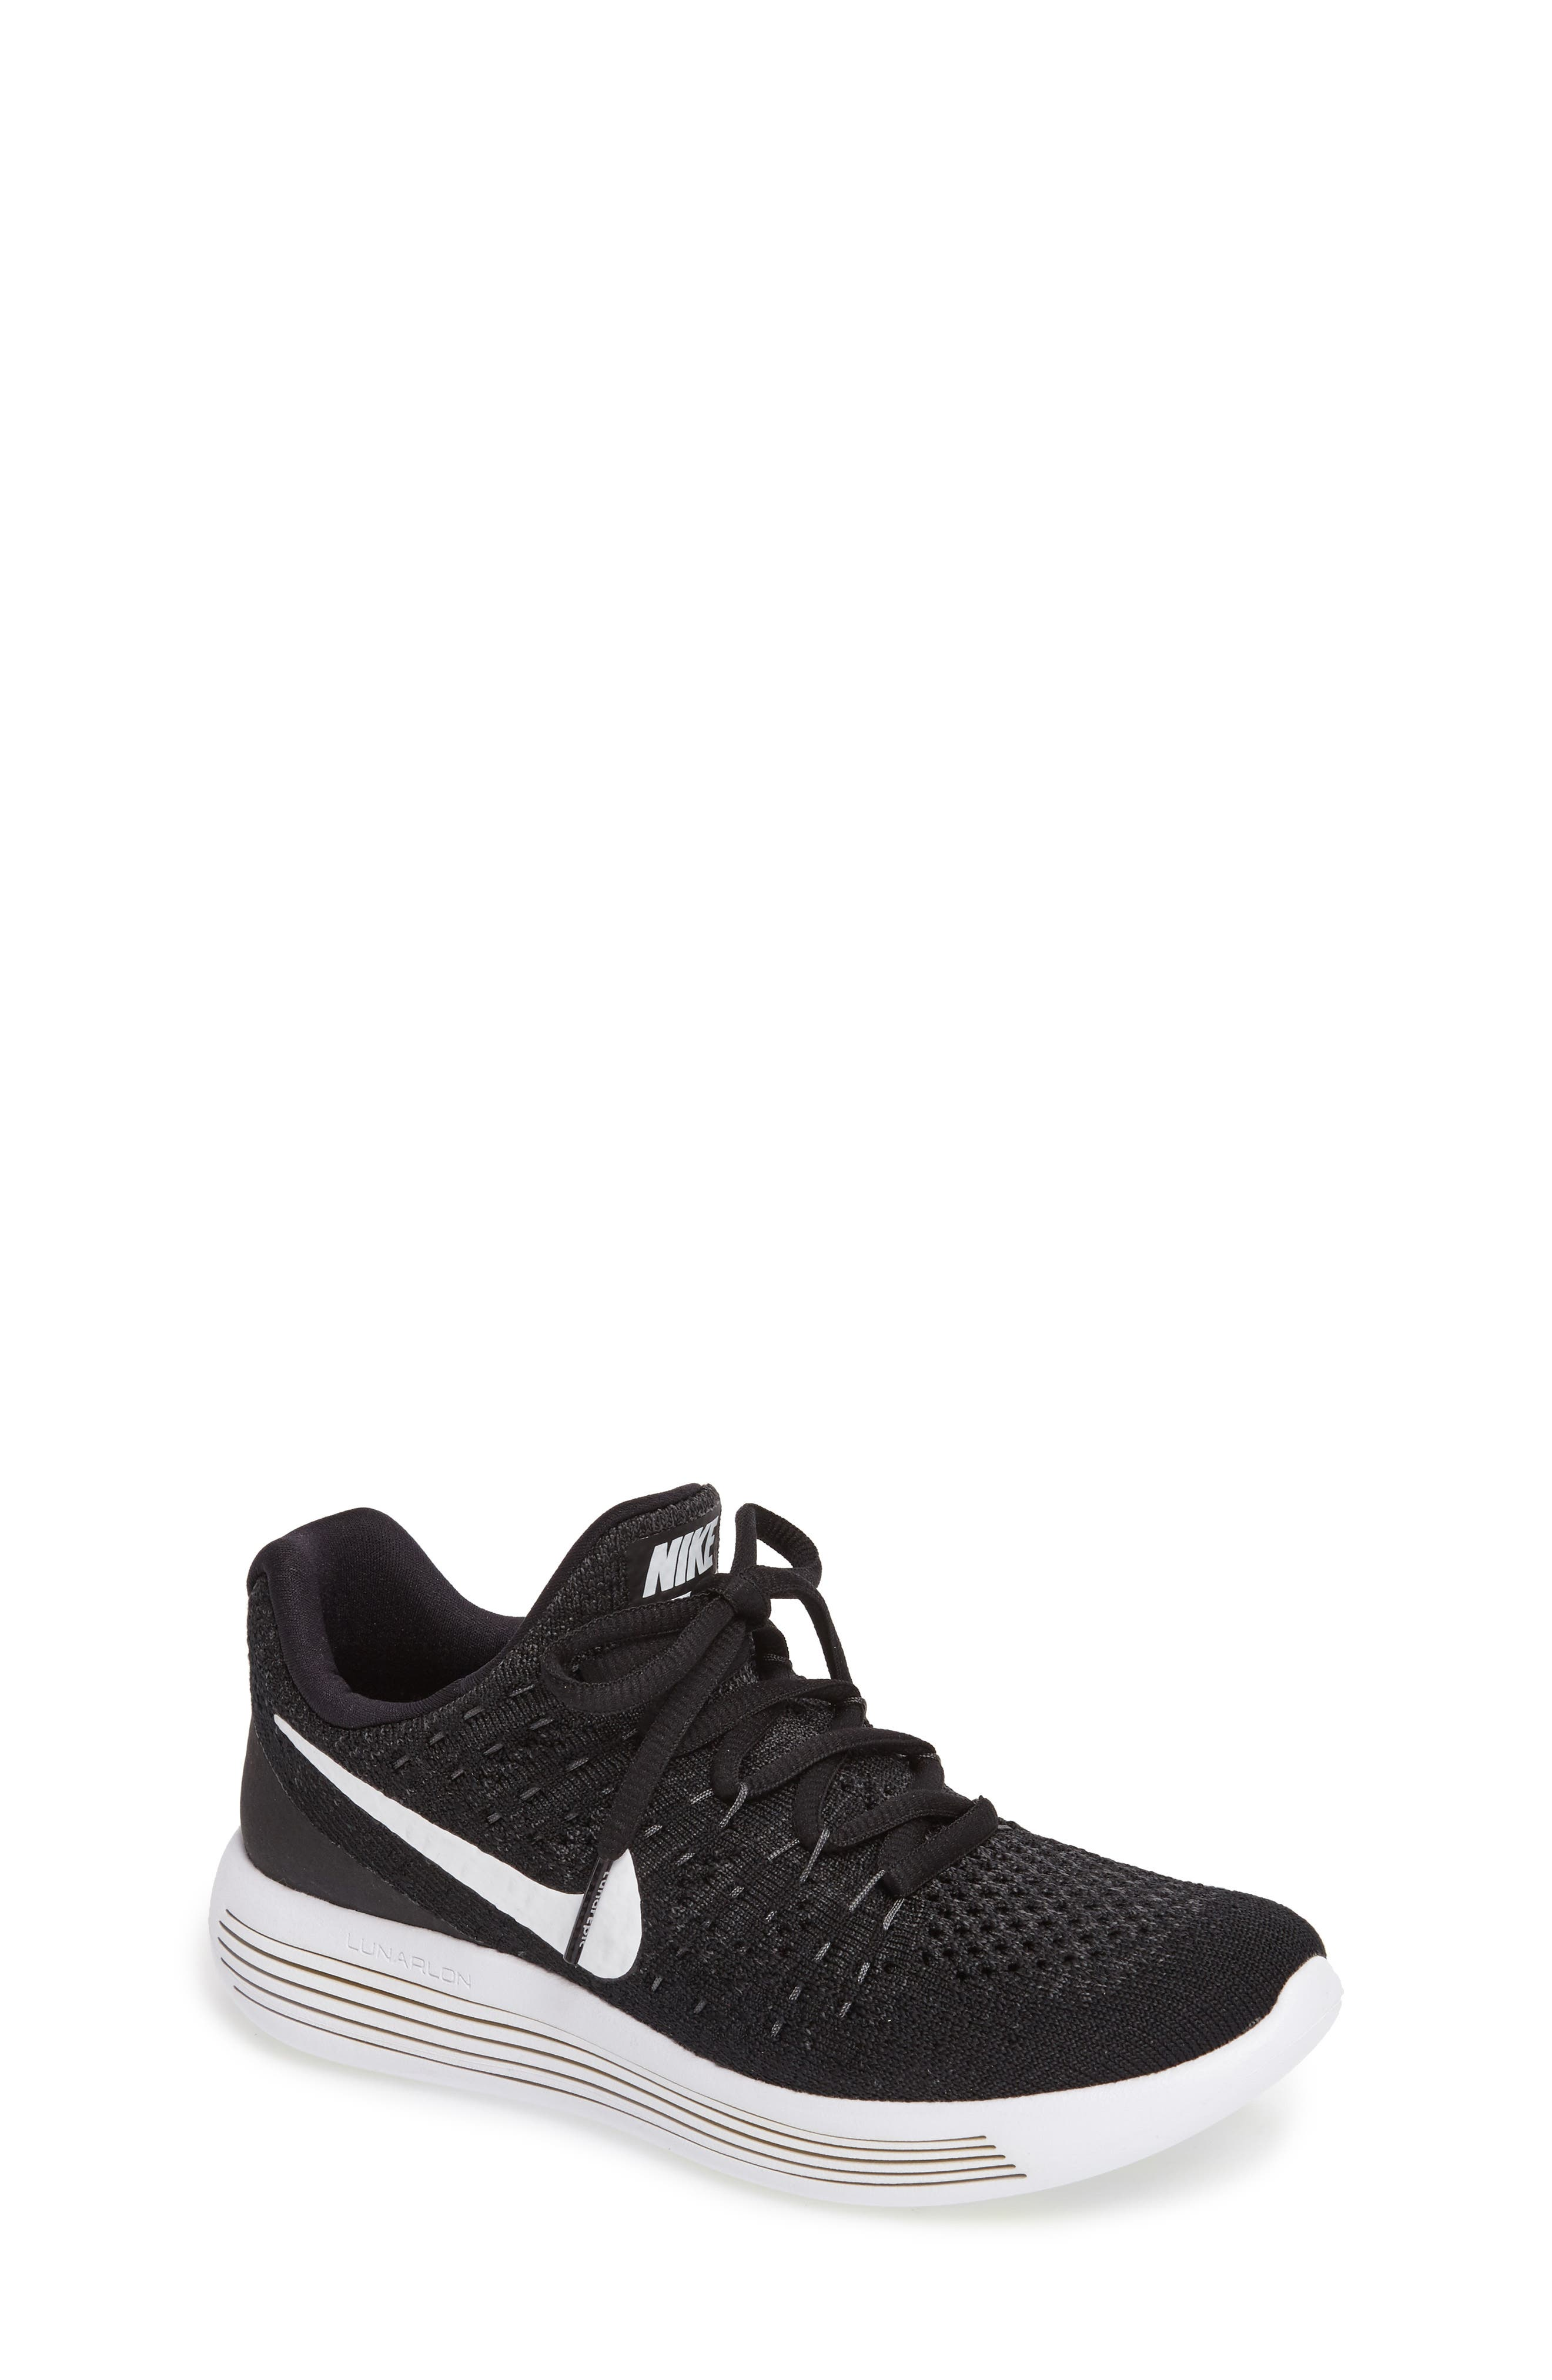 Flyknit LunarEpic Sneaker,                             Main thumbnail 1, color,                             001